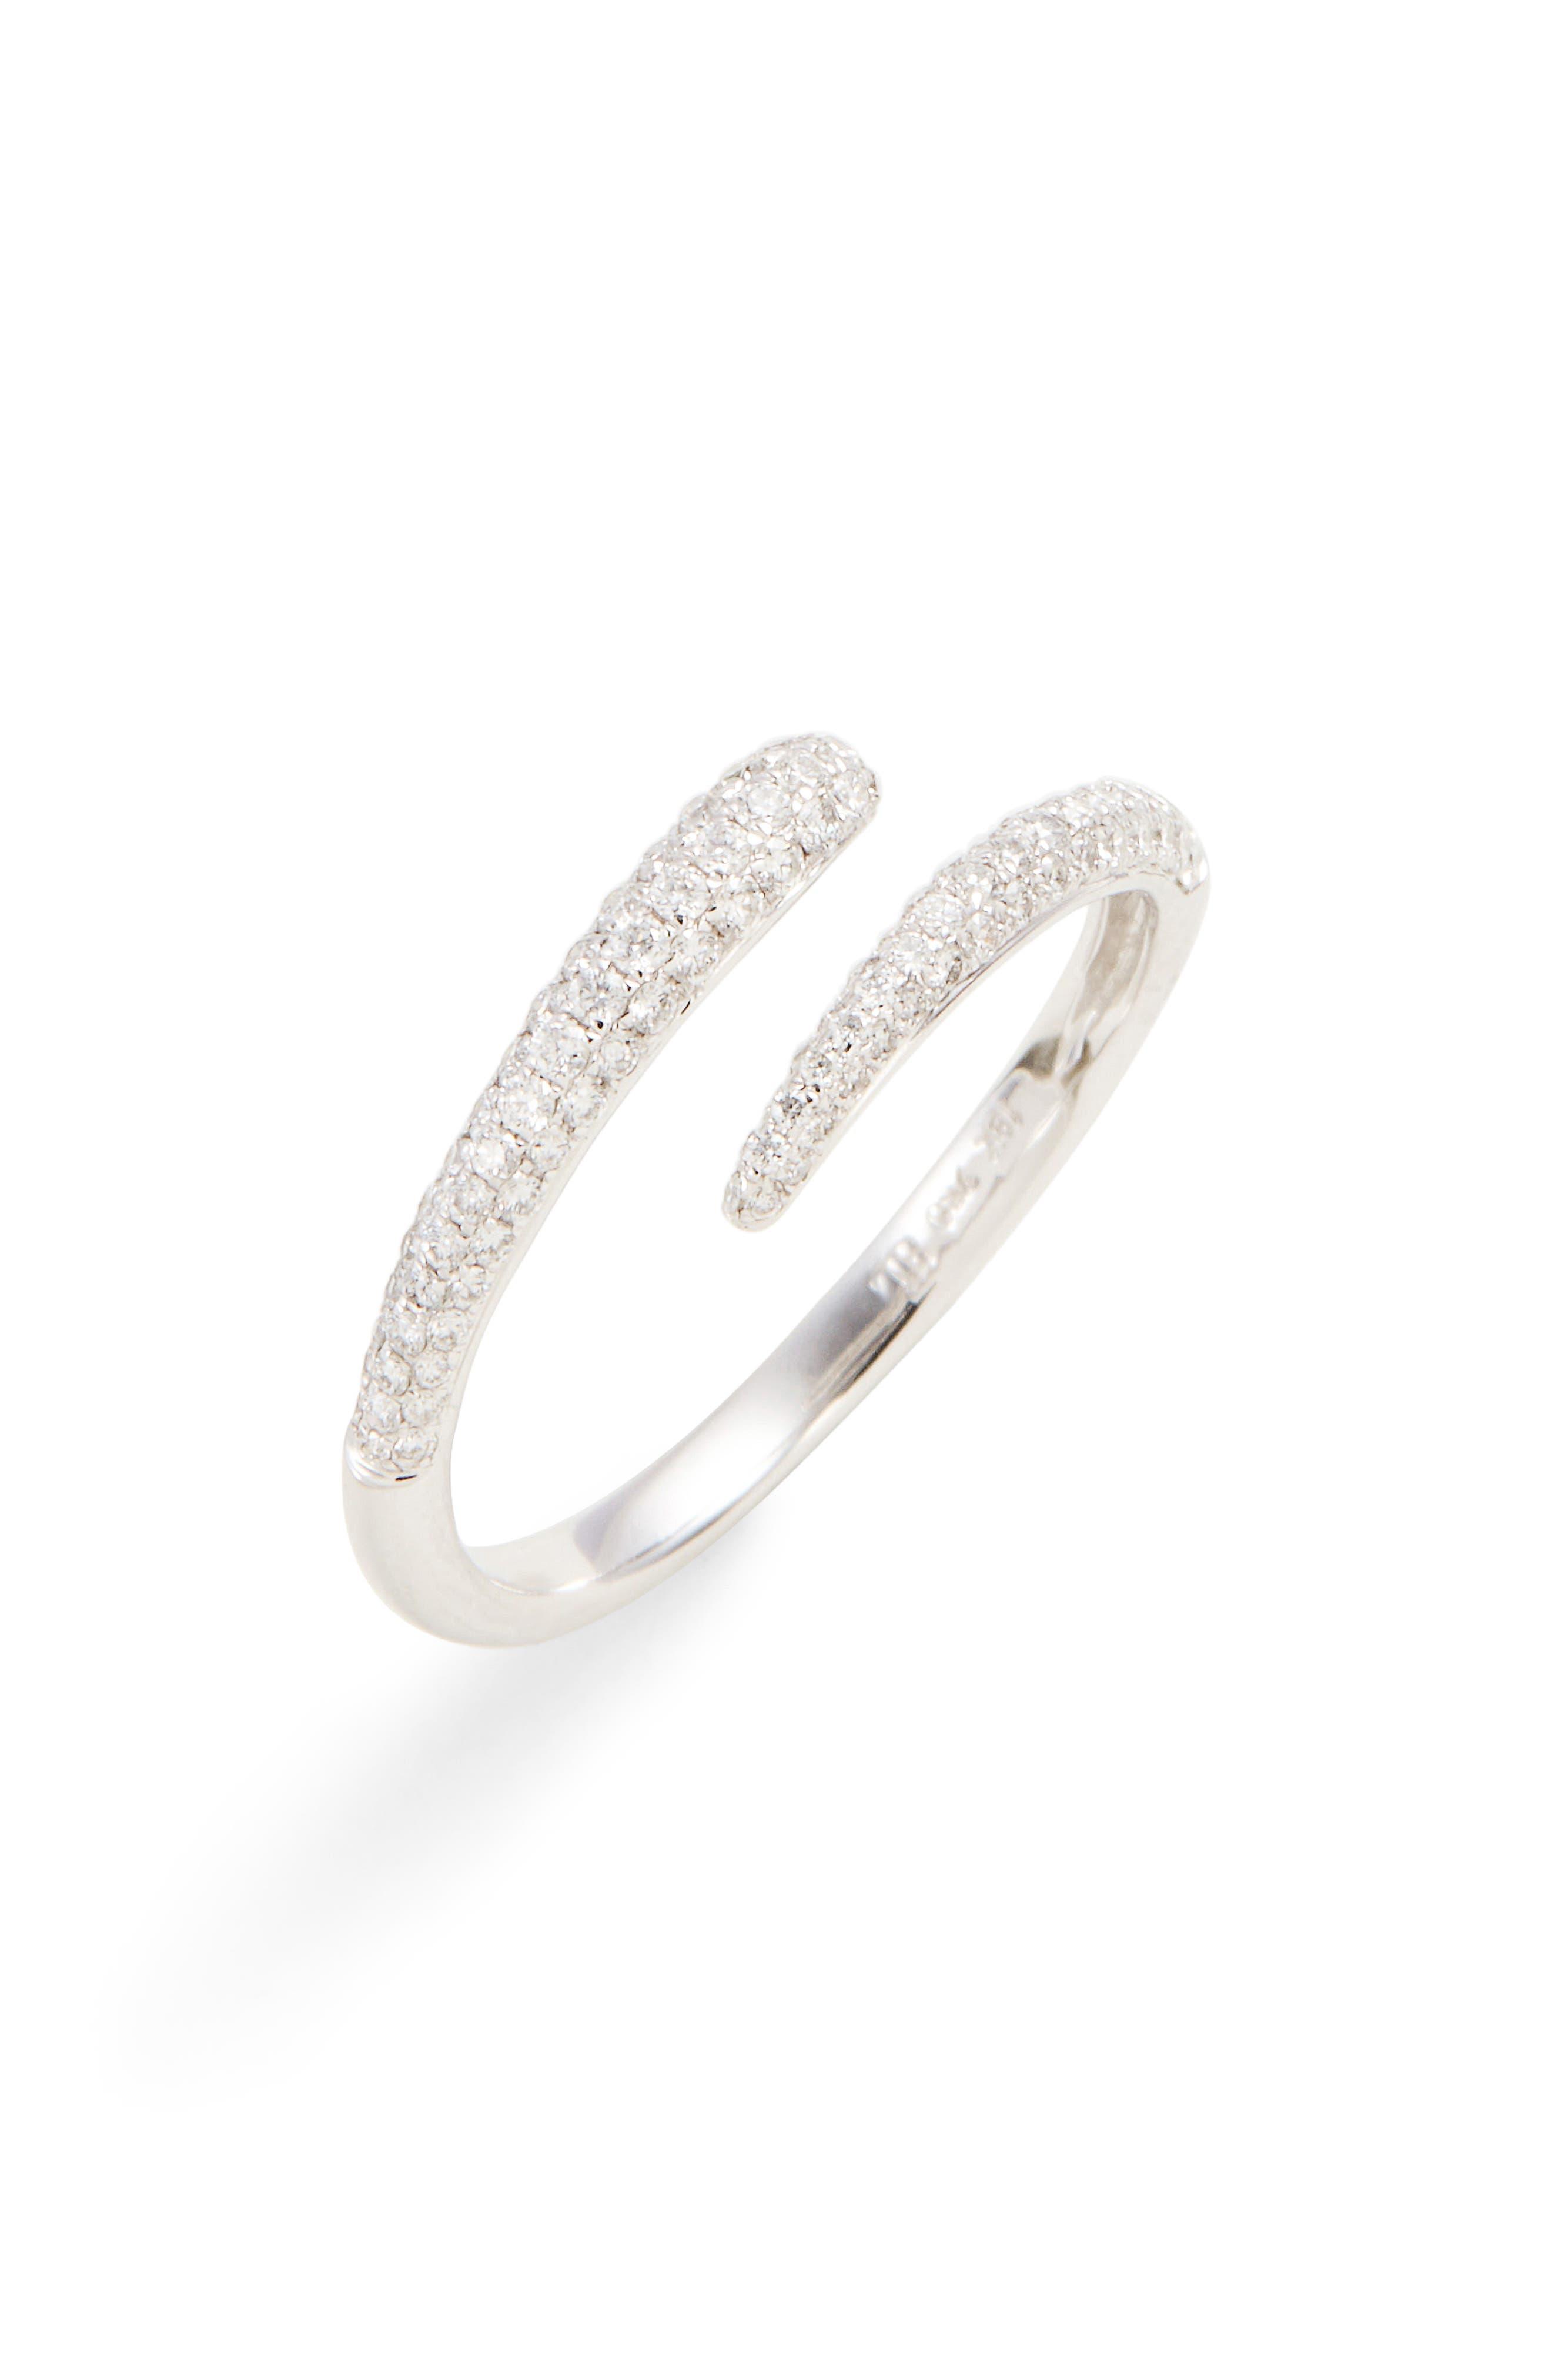 Main Image - Bony Levy Micro Pavé Diamond Openwork Ring (Nordstrom Exclusive)